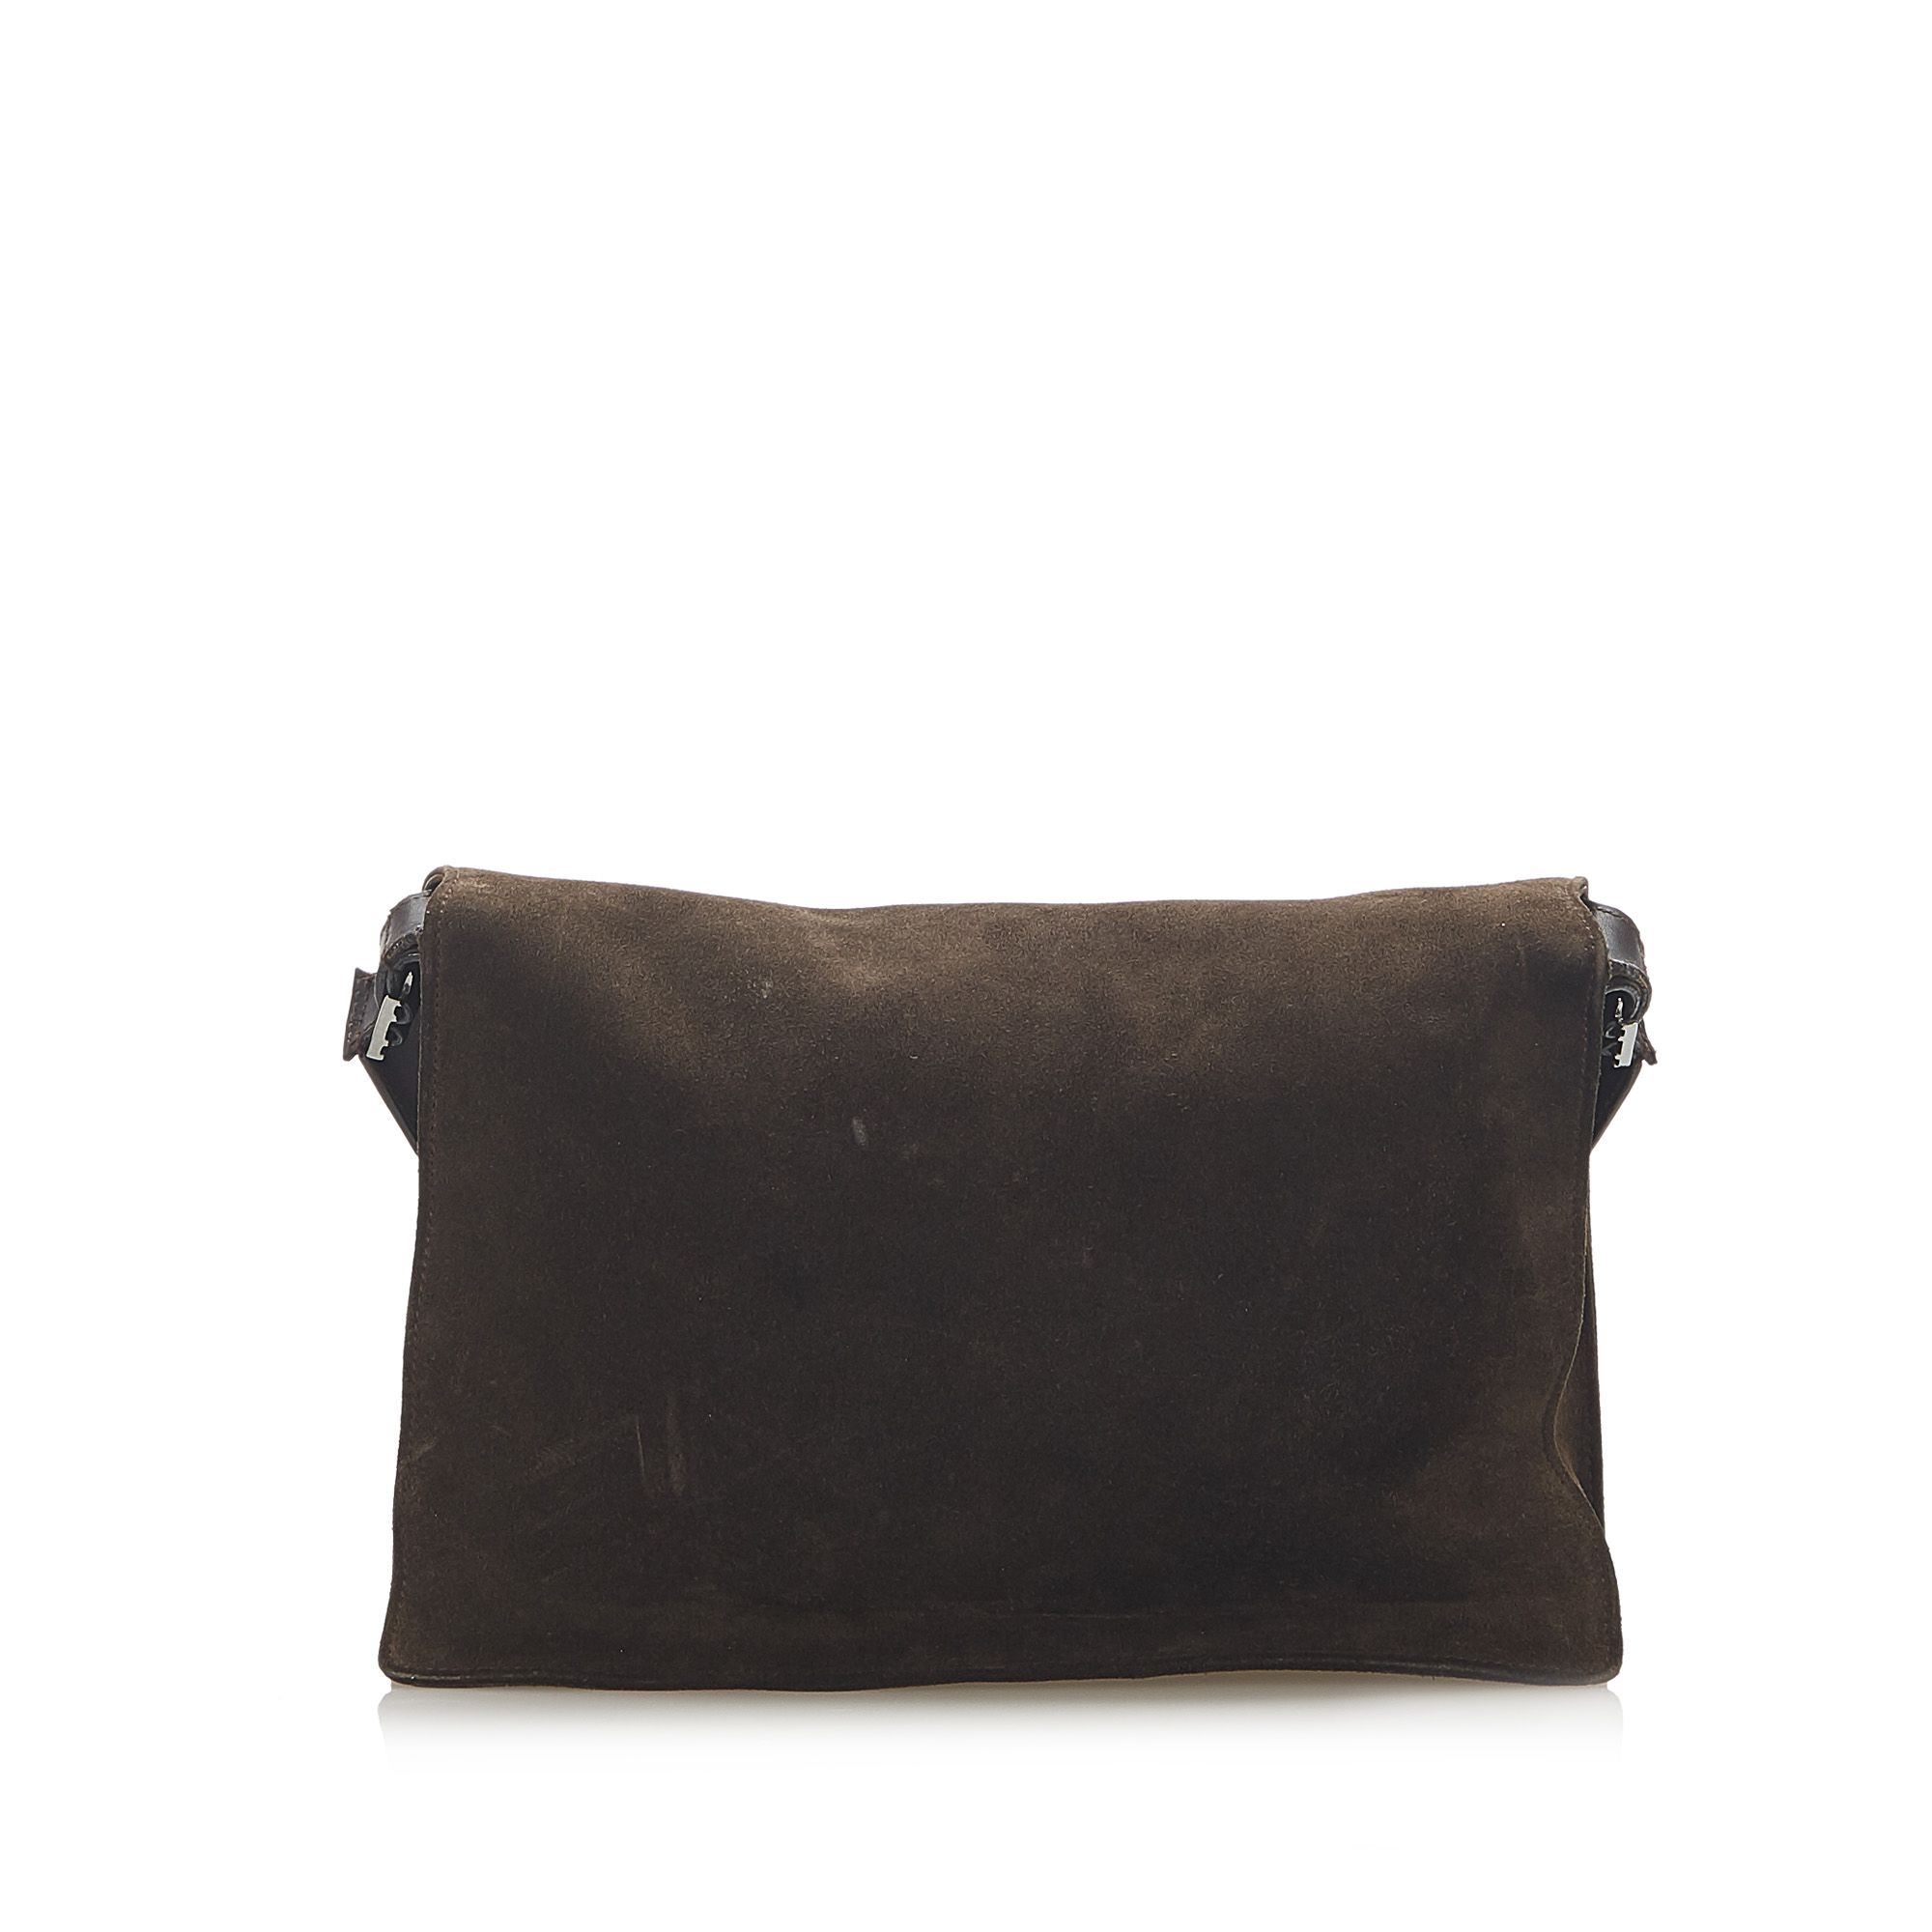 Vintage Gucci Suede Shoulder Bag Brown